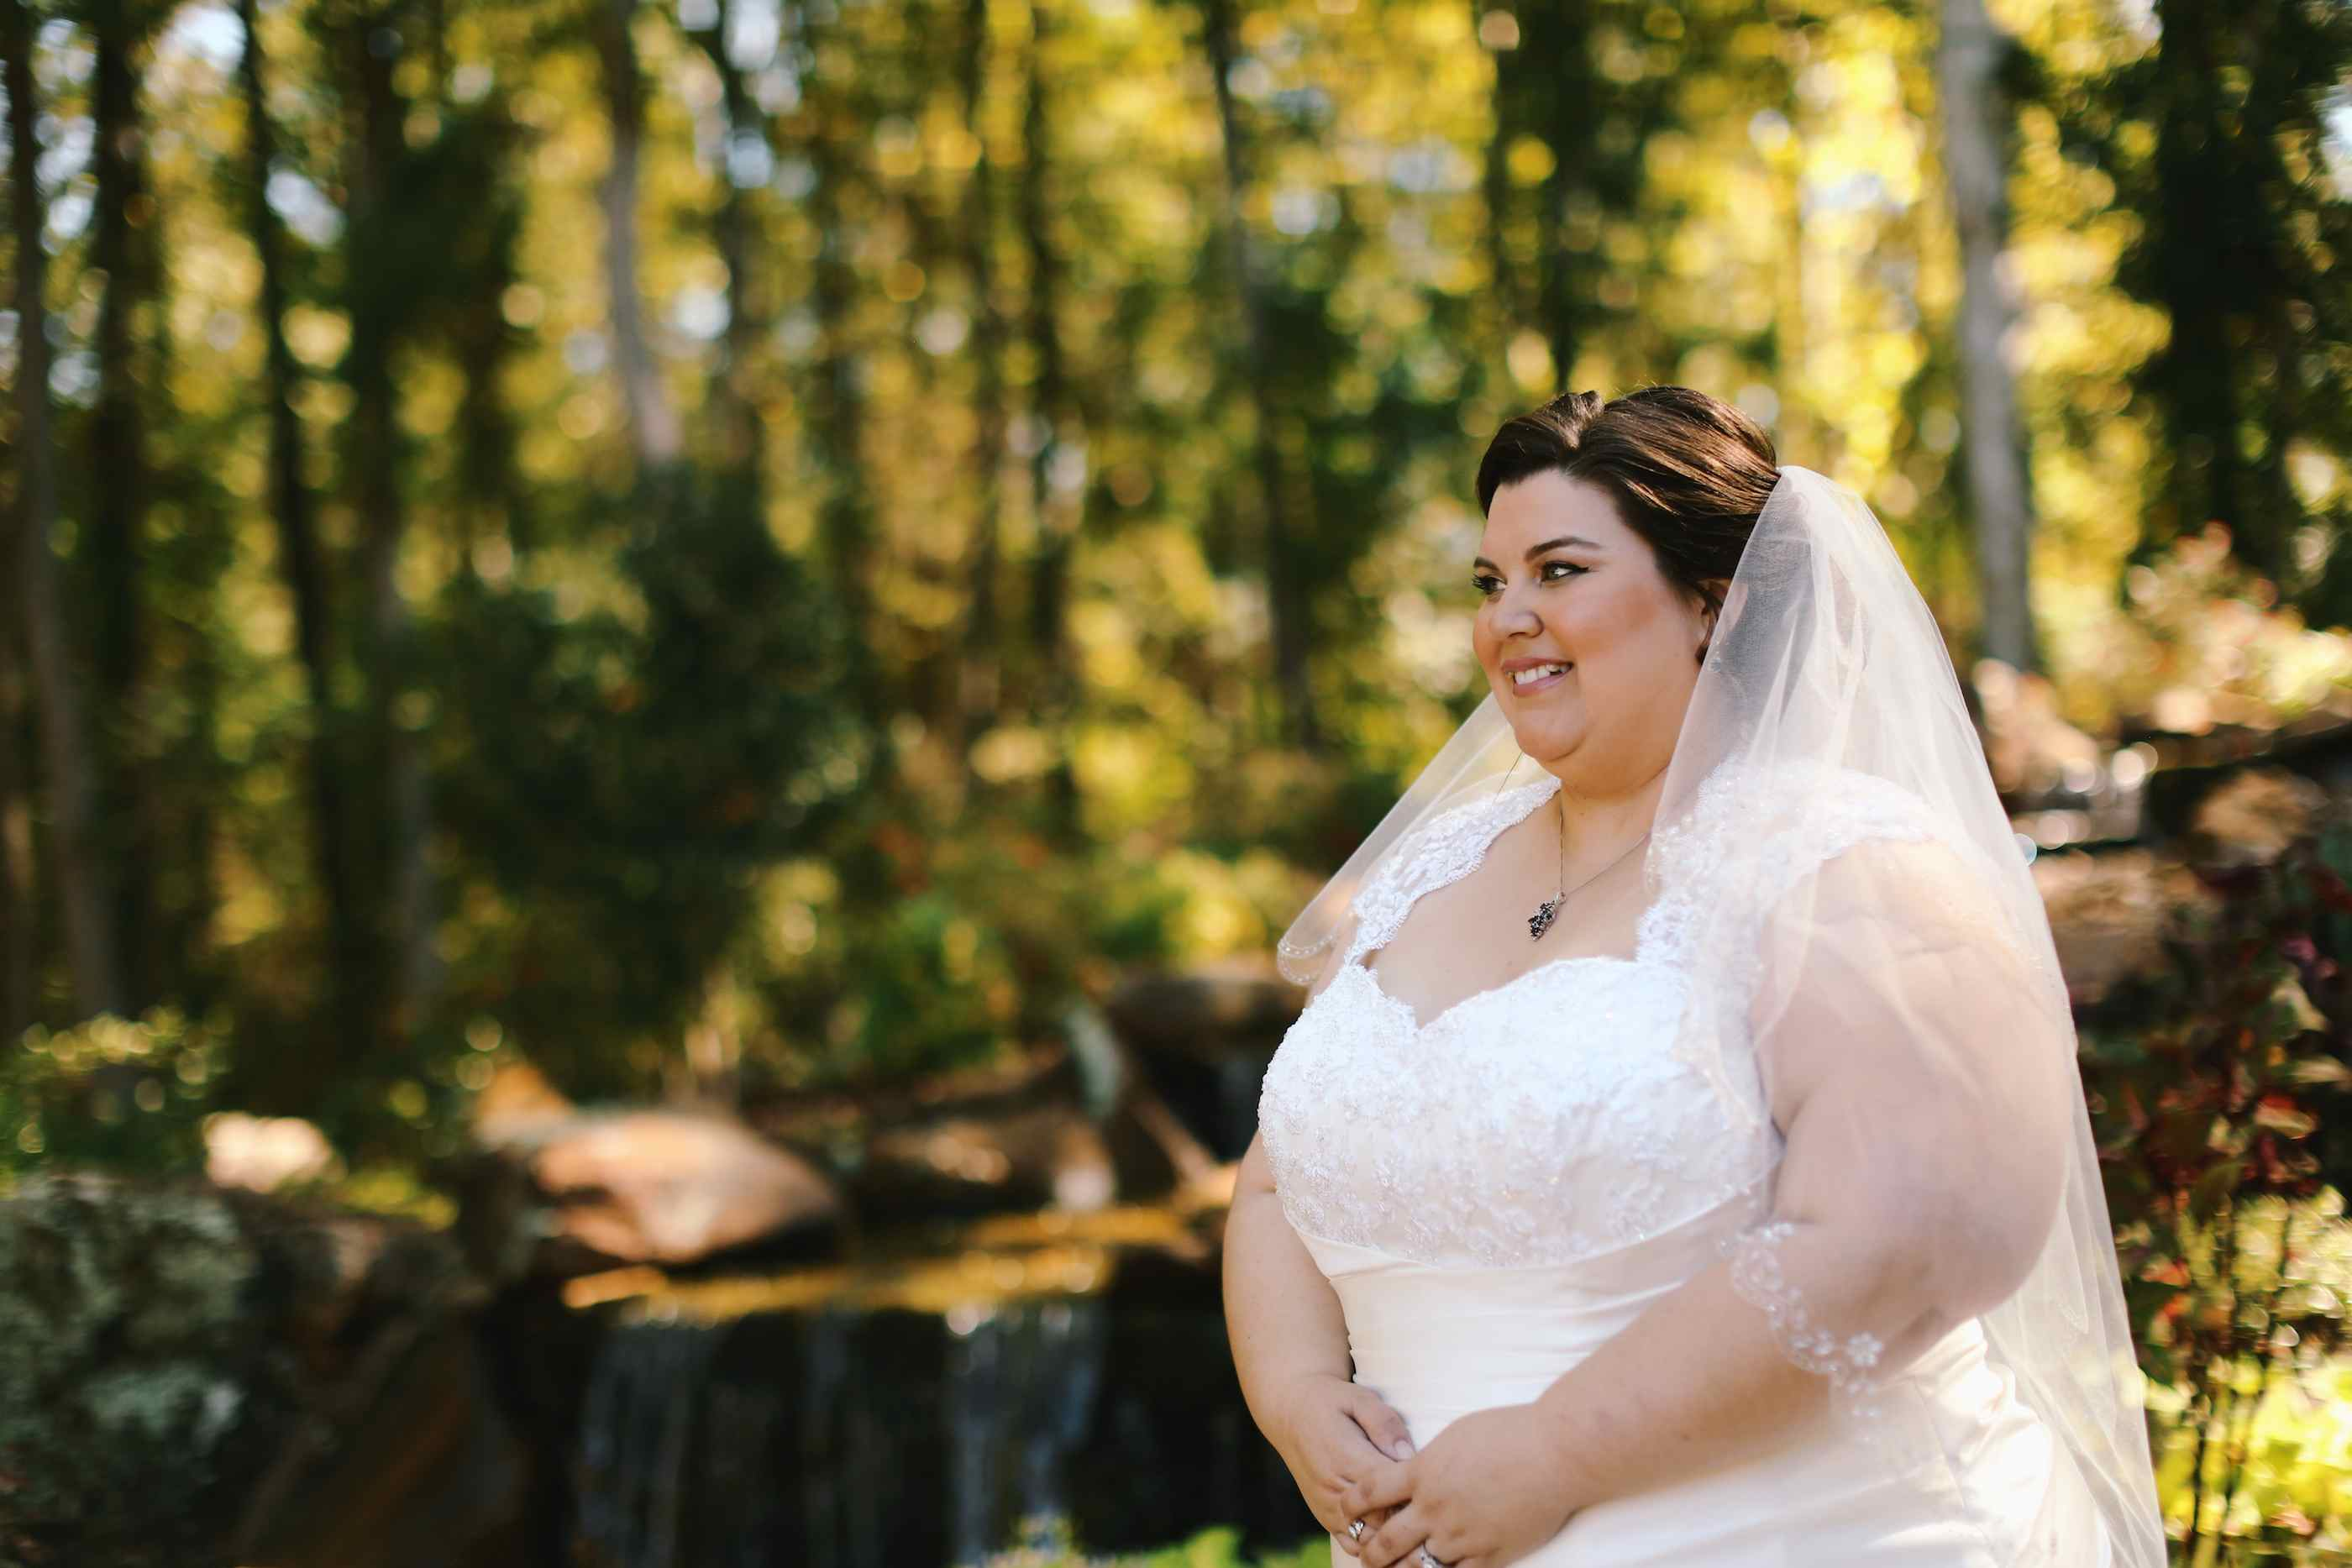 top-10-bride-photos-2013-009